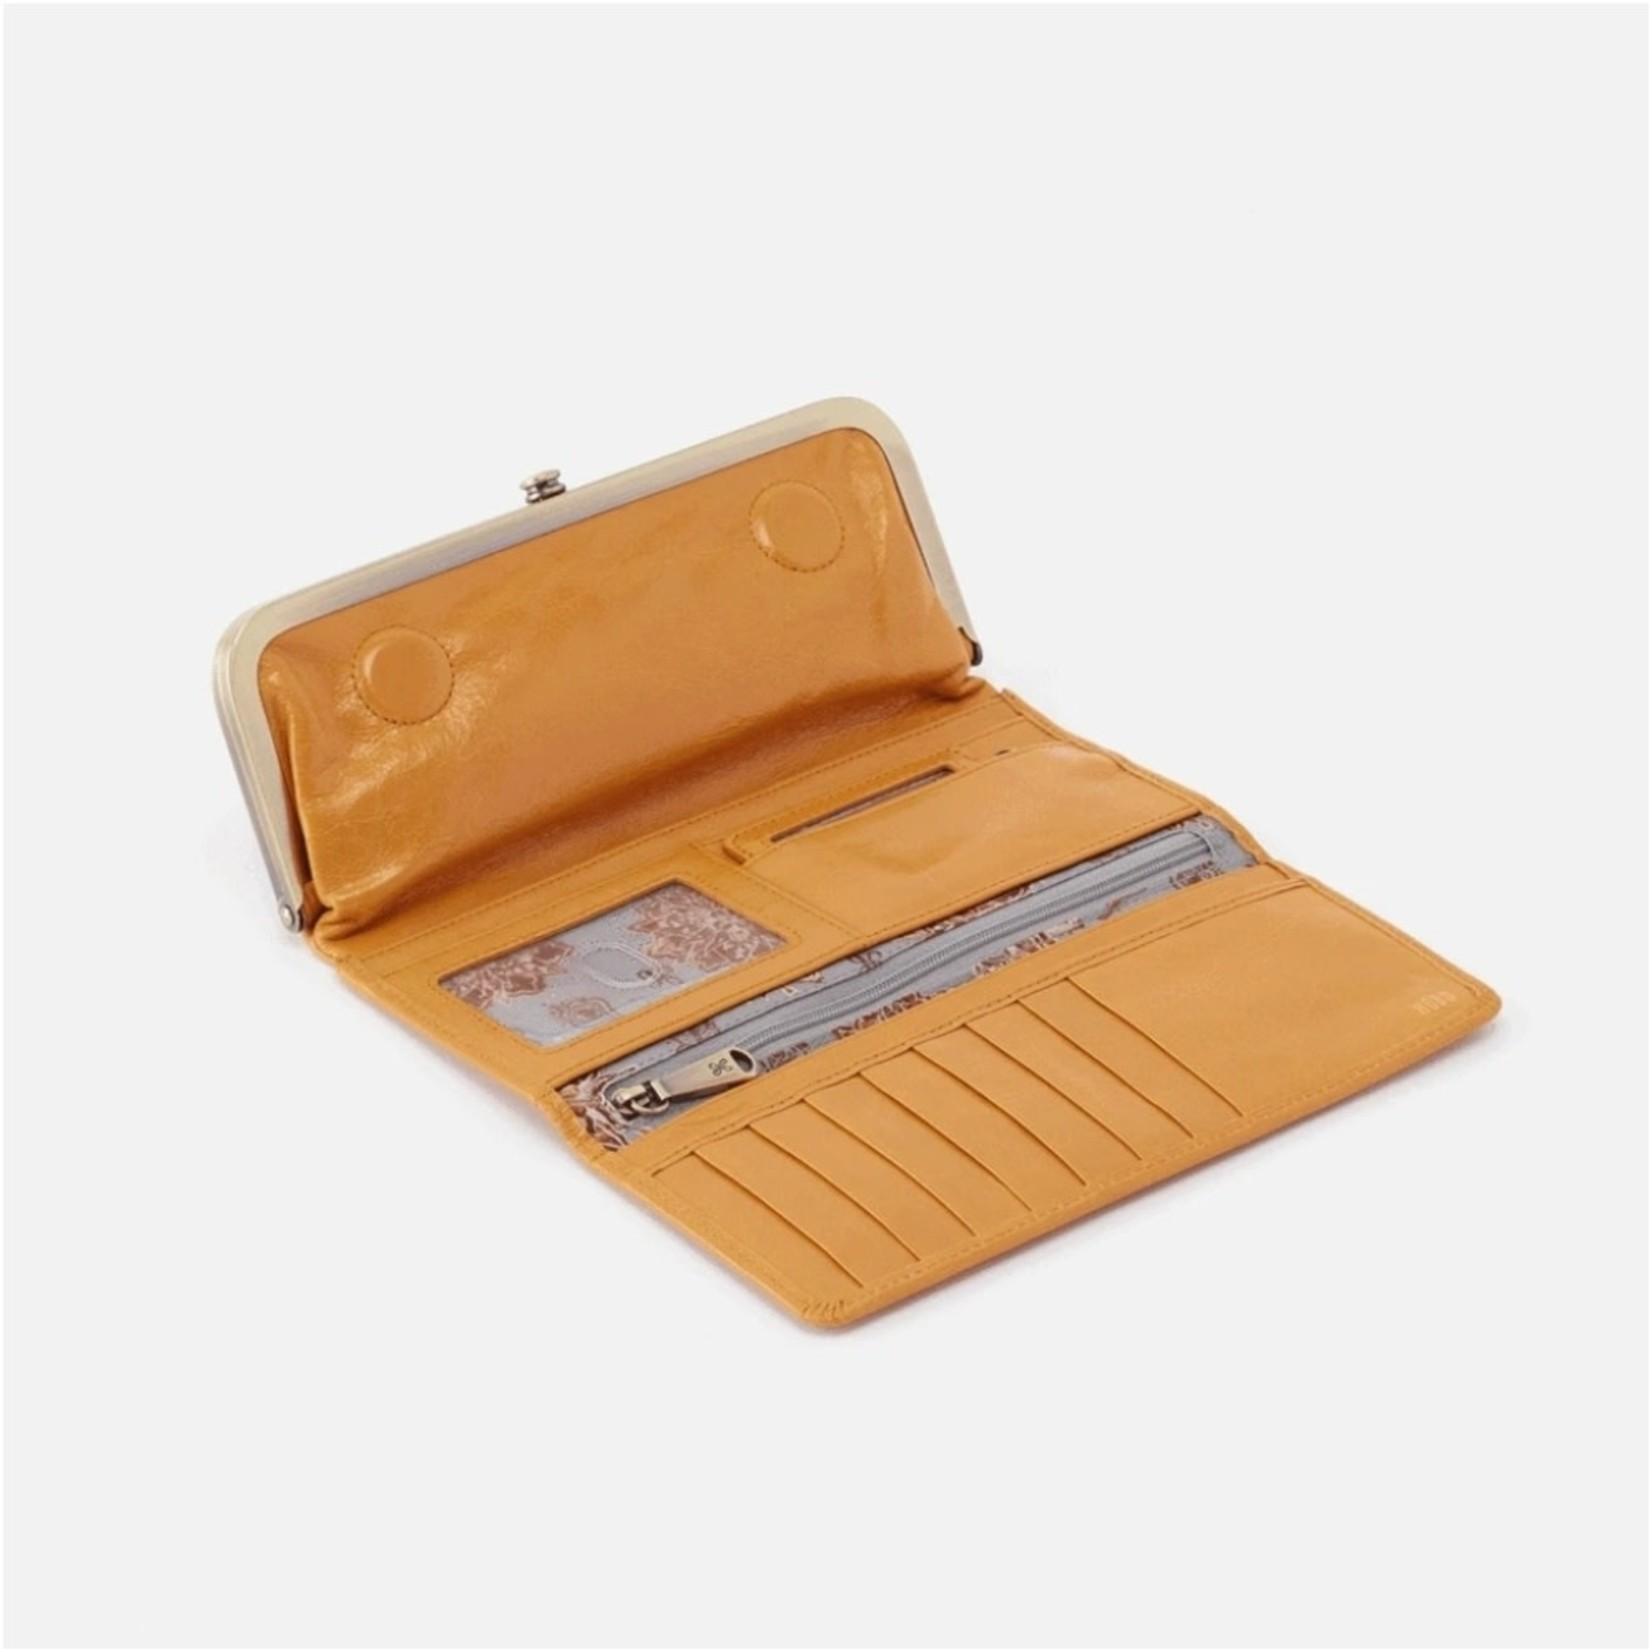 HOBO Rachel Mustard Vintage Leather Foldover Wallet